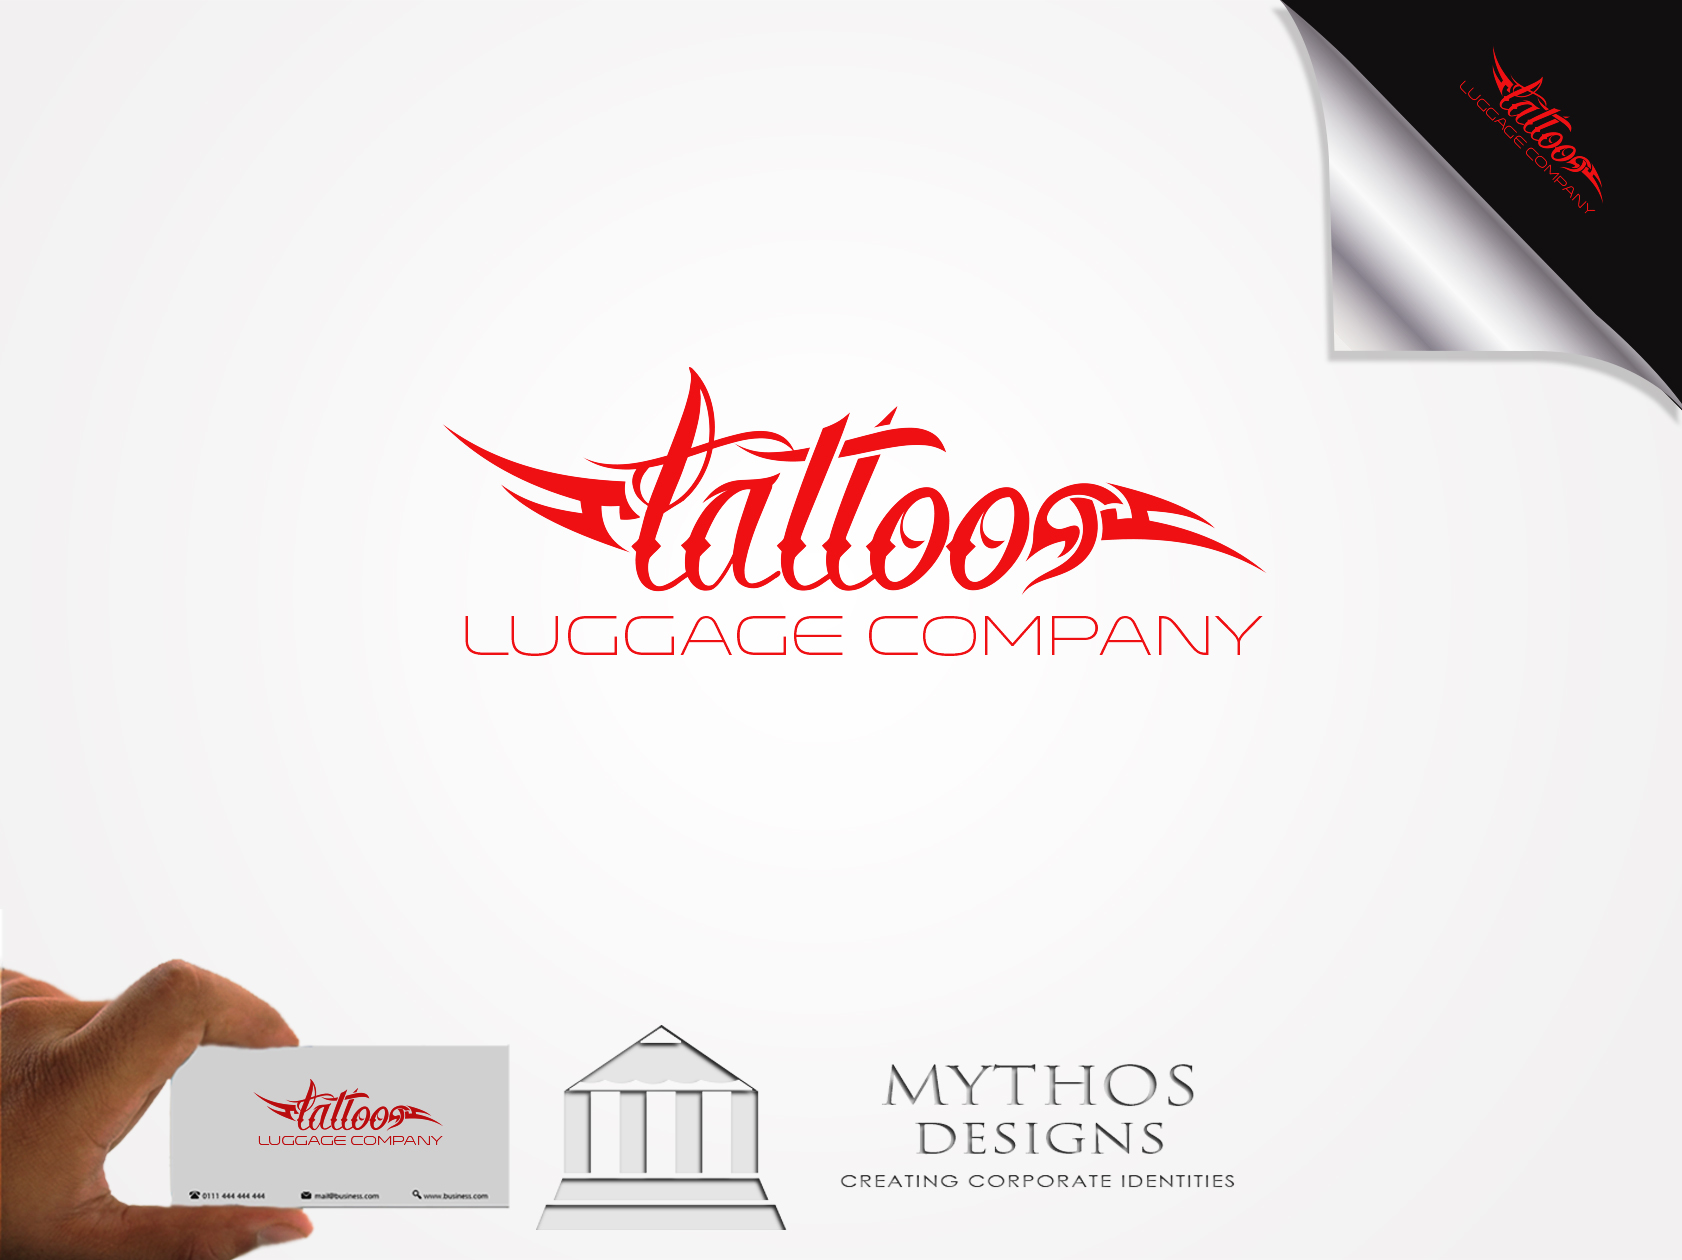 Logo Design by Mythos Designs - Entry No. 134 in the Logo Design Contest Artistic Logo Design for Tattoo Luggage Company.